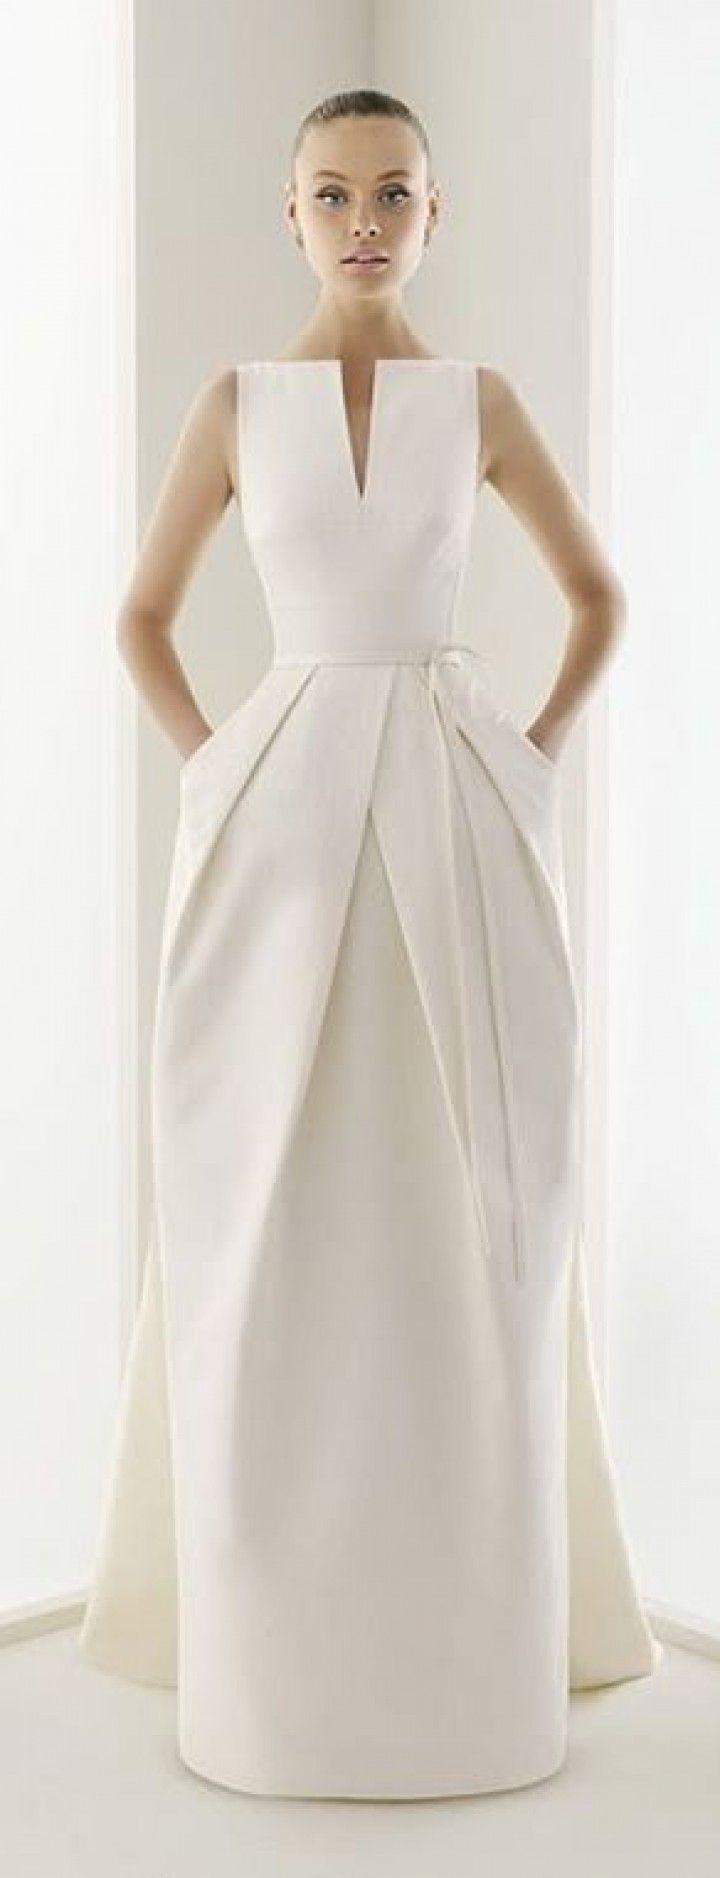 Omg I love this dress it's so cute